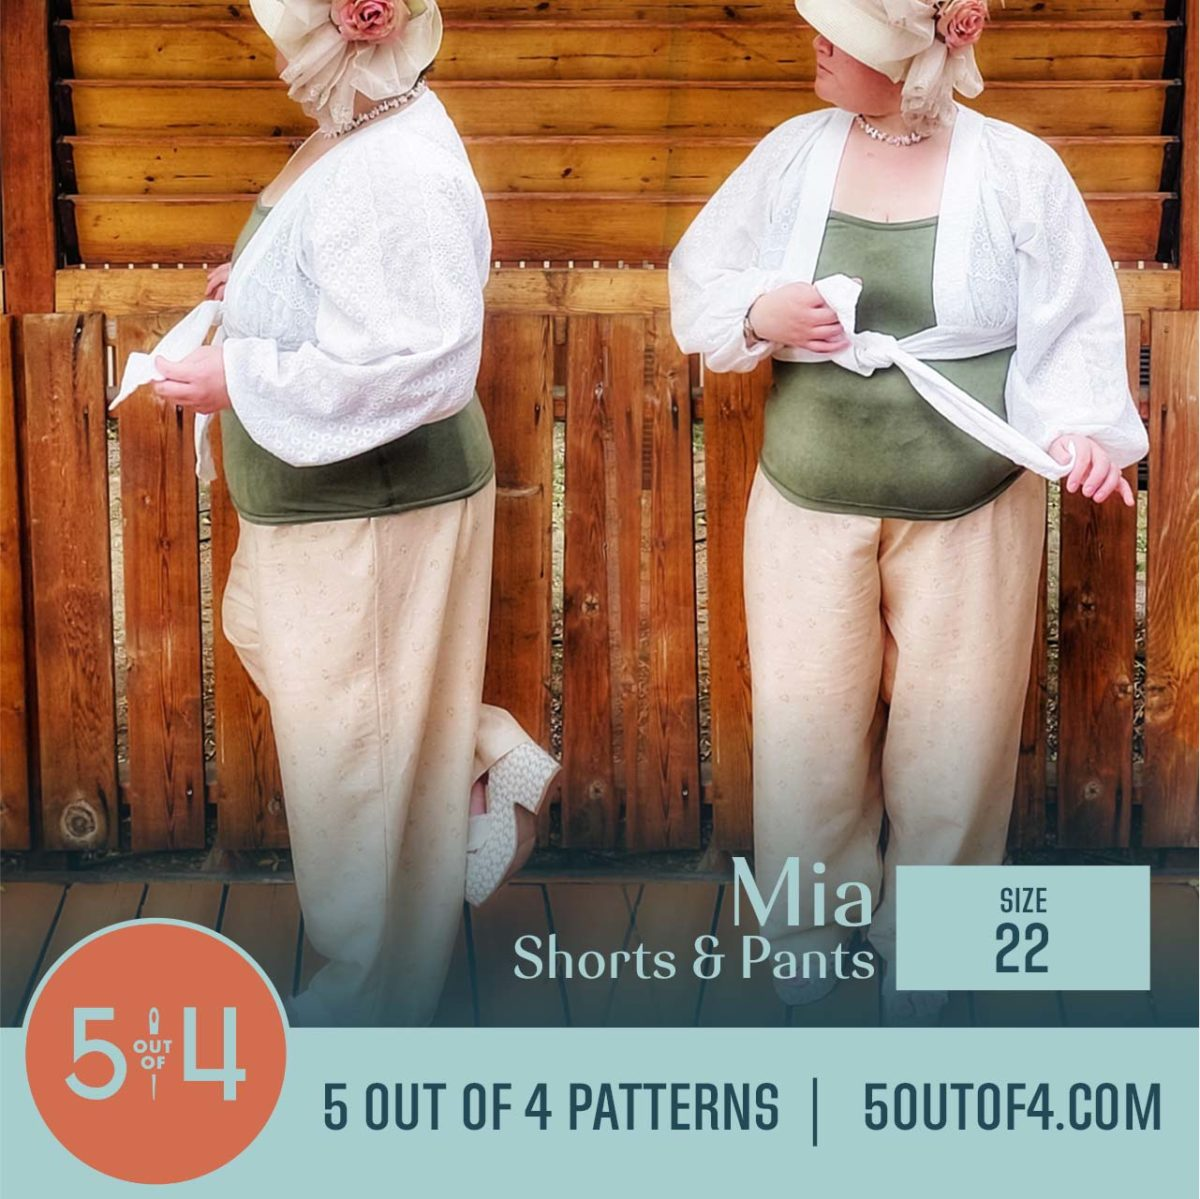 5oo4 Patterns Mia Pants size 22